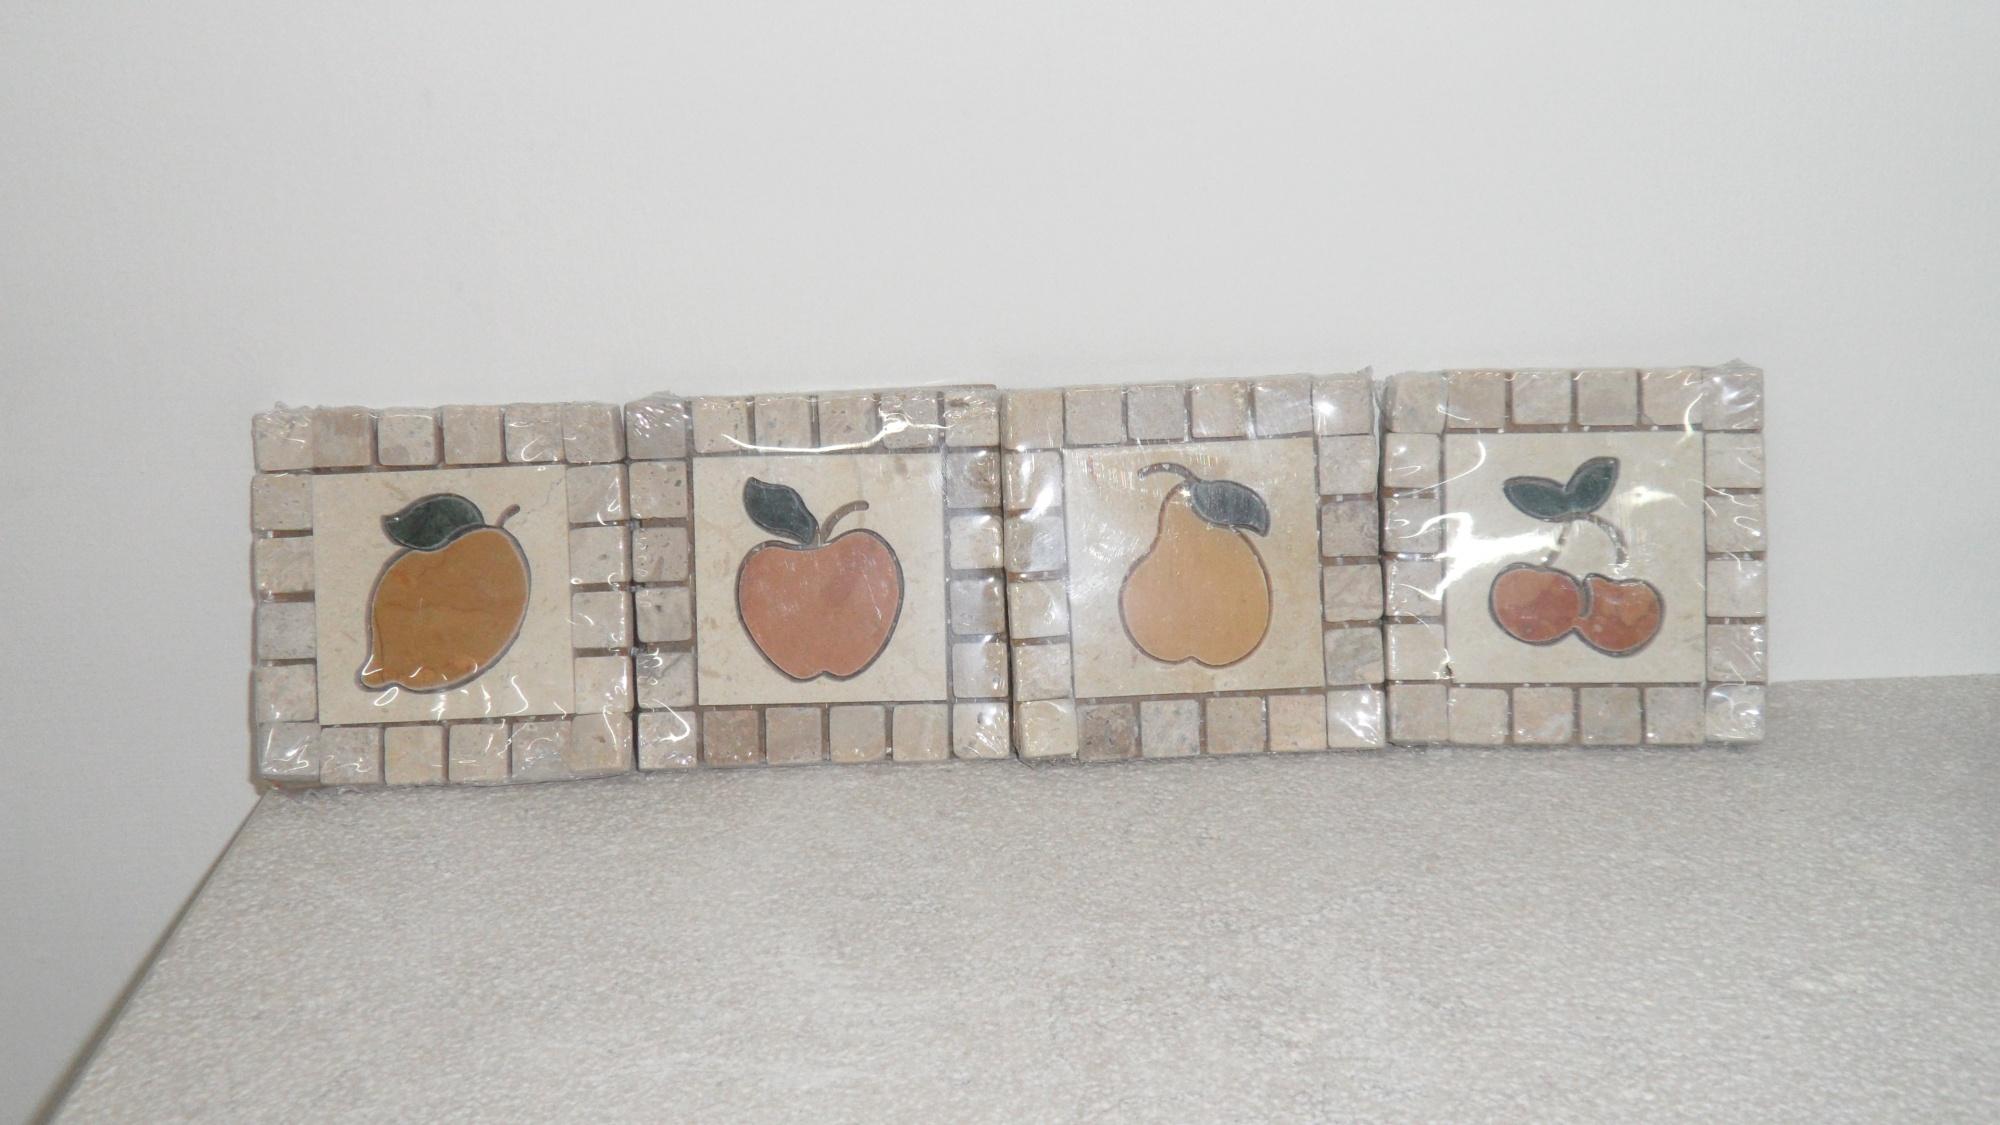 INSERTI FRUTTA decorazioni in marmo per cucina in muratura